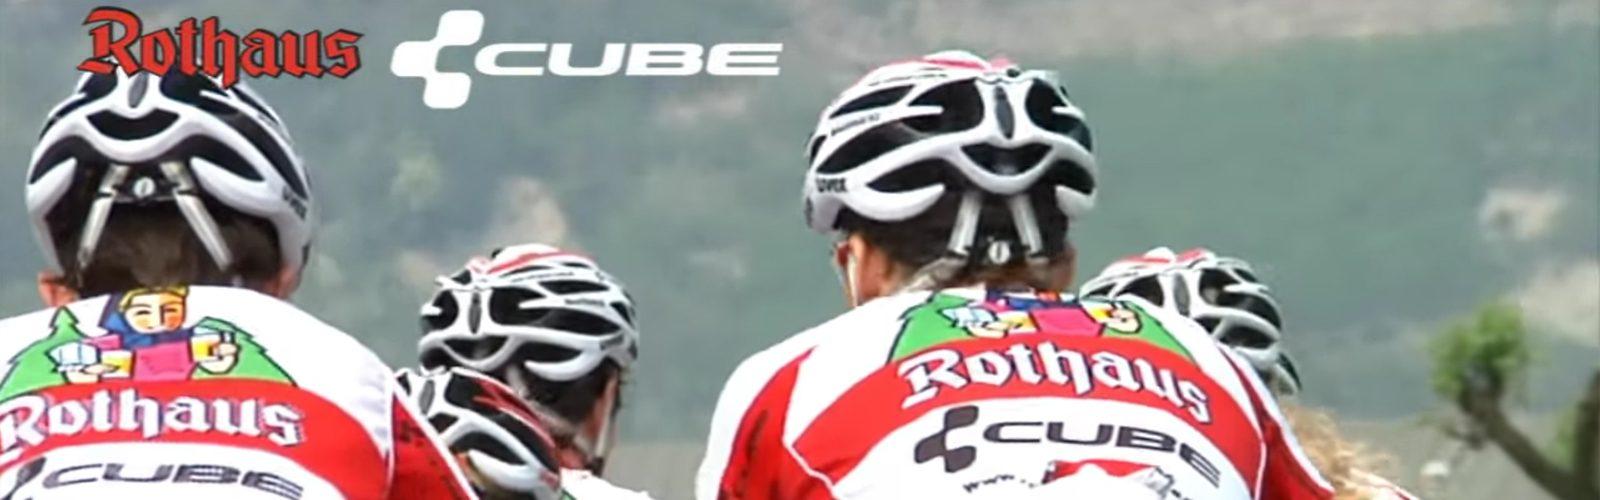 Rothaus Cube Bikes Eventvideo Eventfilm Tourismusvideo